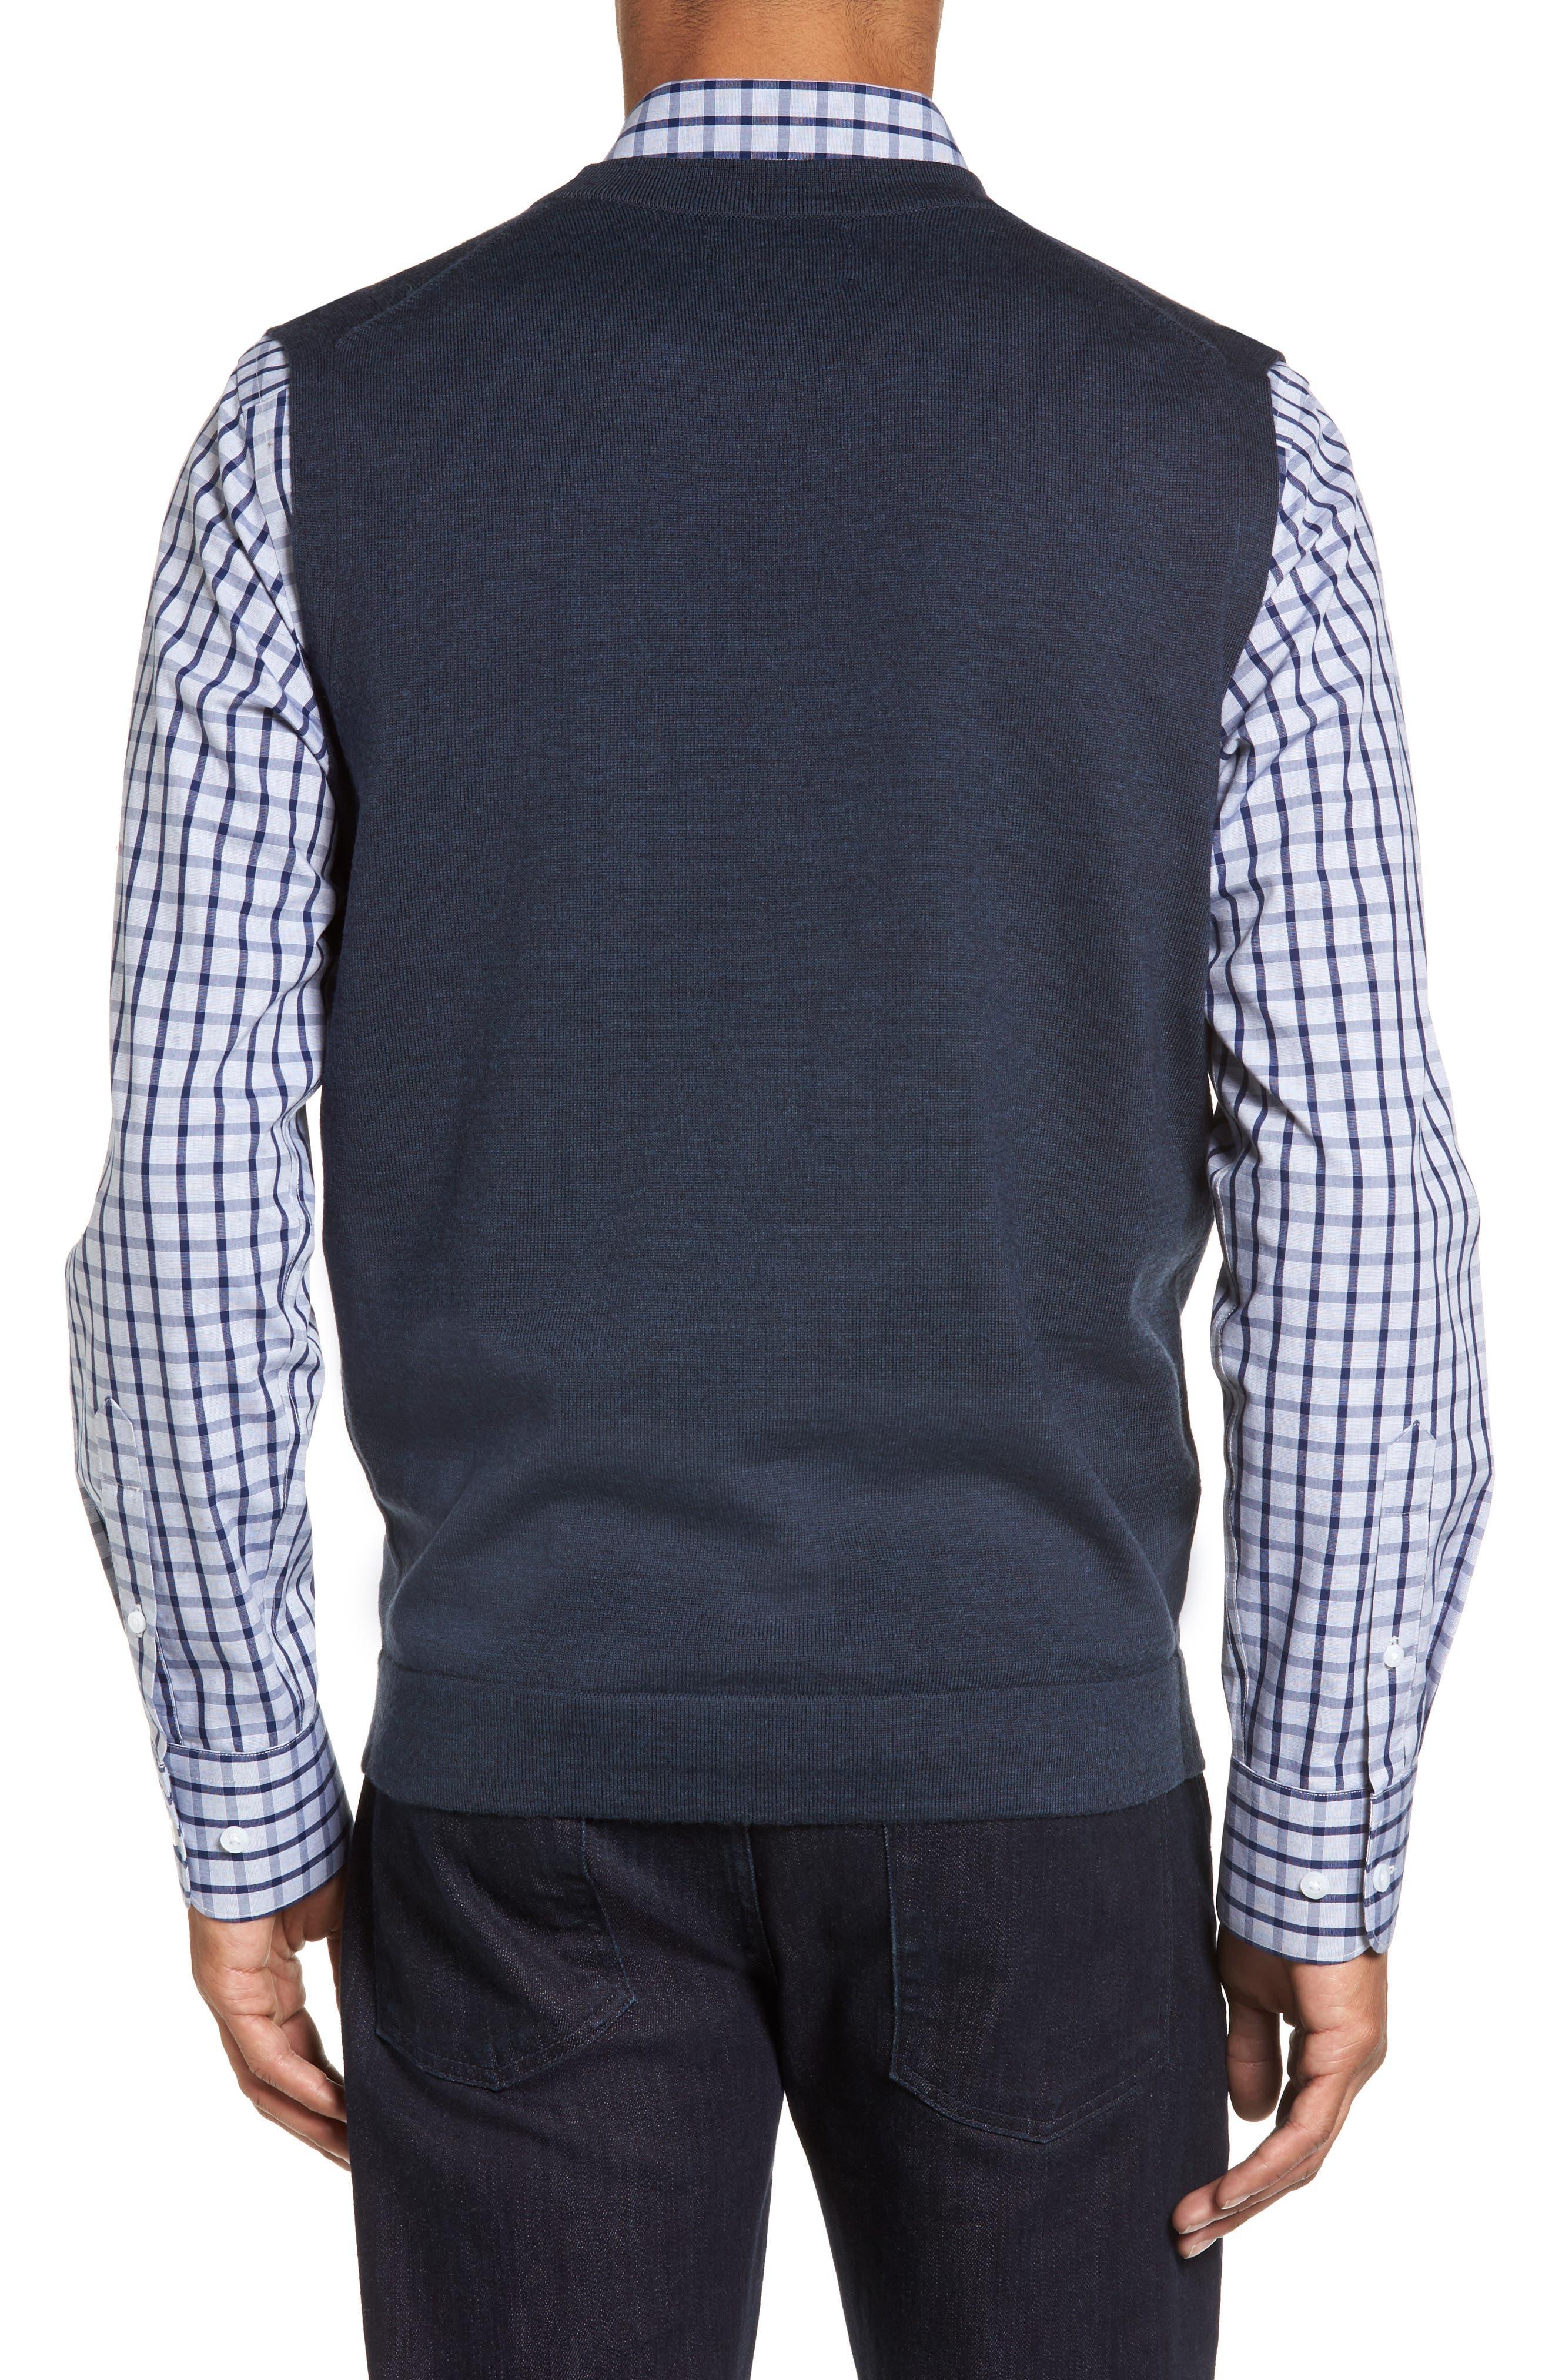 Alternate Image 2  - Nordstrom Men's Shop Merino Button Front Sweater Vest